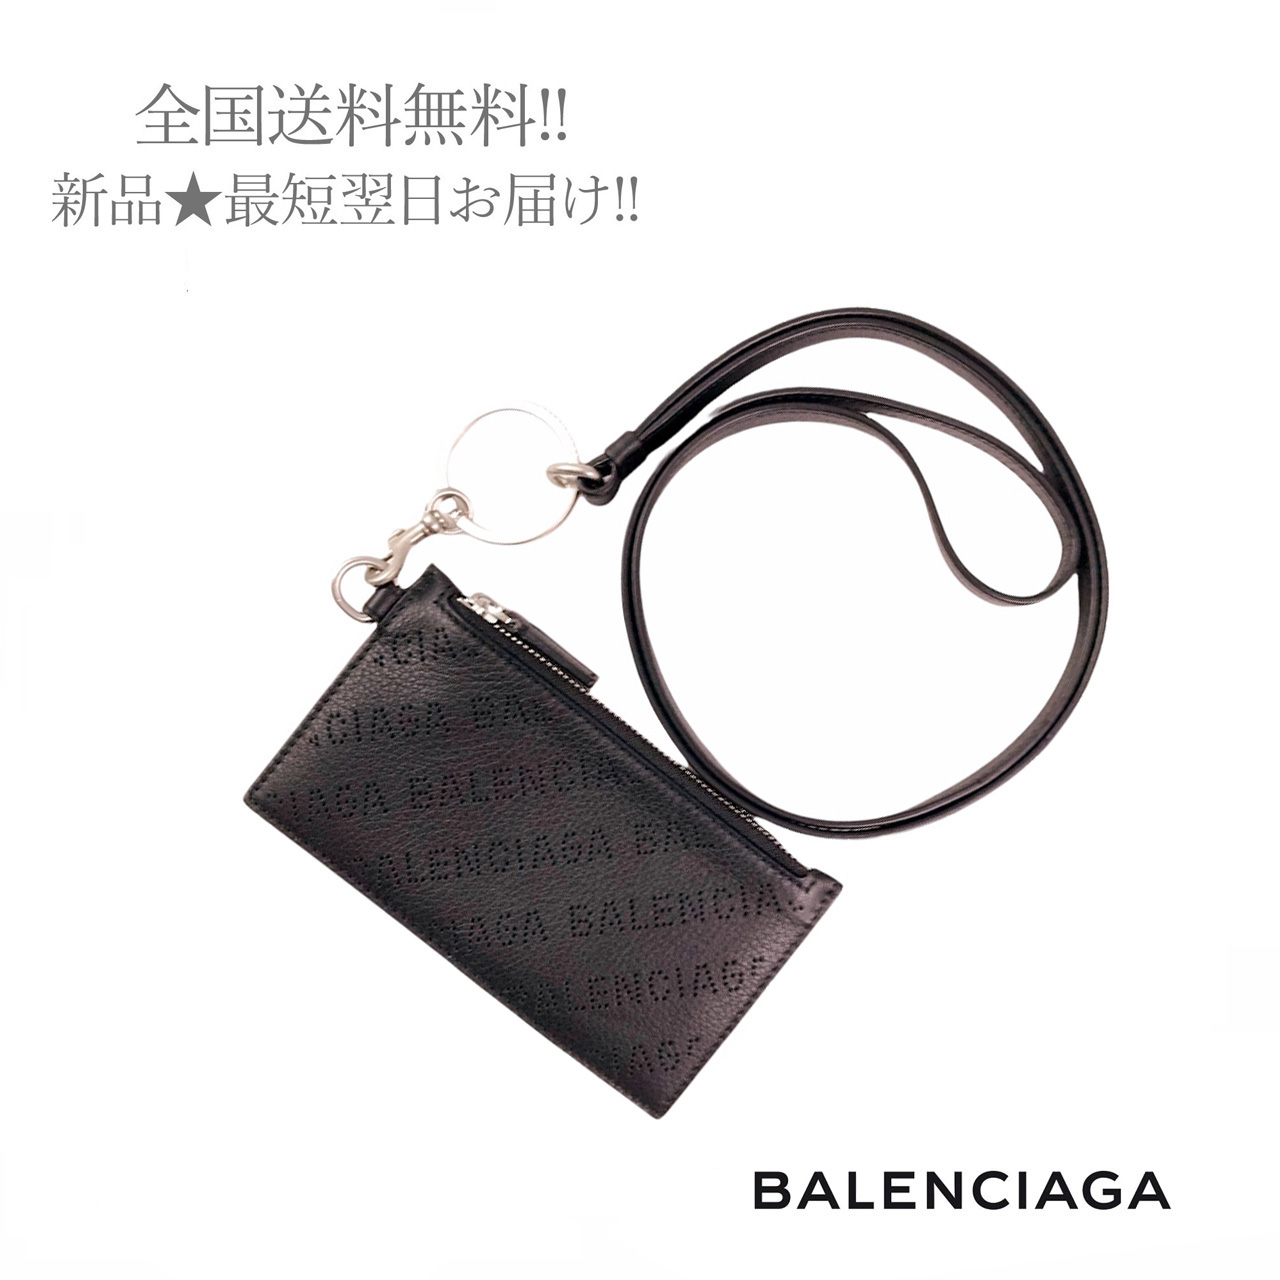 BALENCIAGA バレンシアガ カードケース キャッシュ キーリング付き ドット ロゴ 新品 1000 レディース メイルオーダー イタリア製 女 ブラック 宅配便送料無料